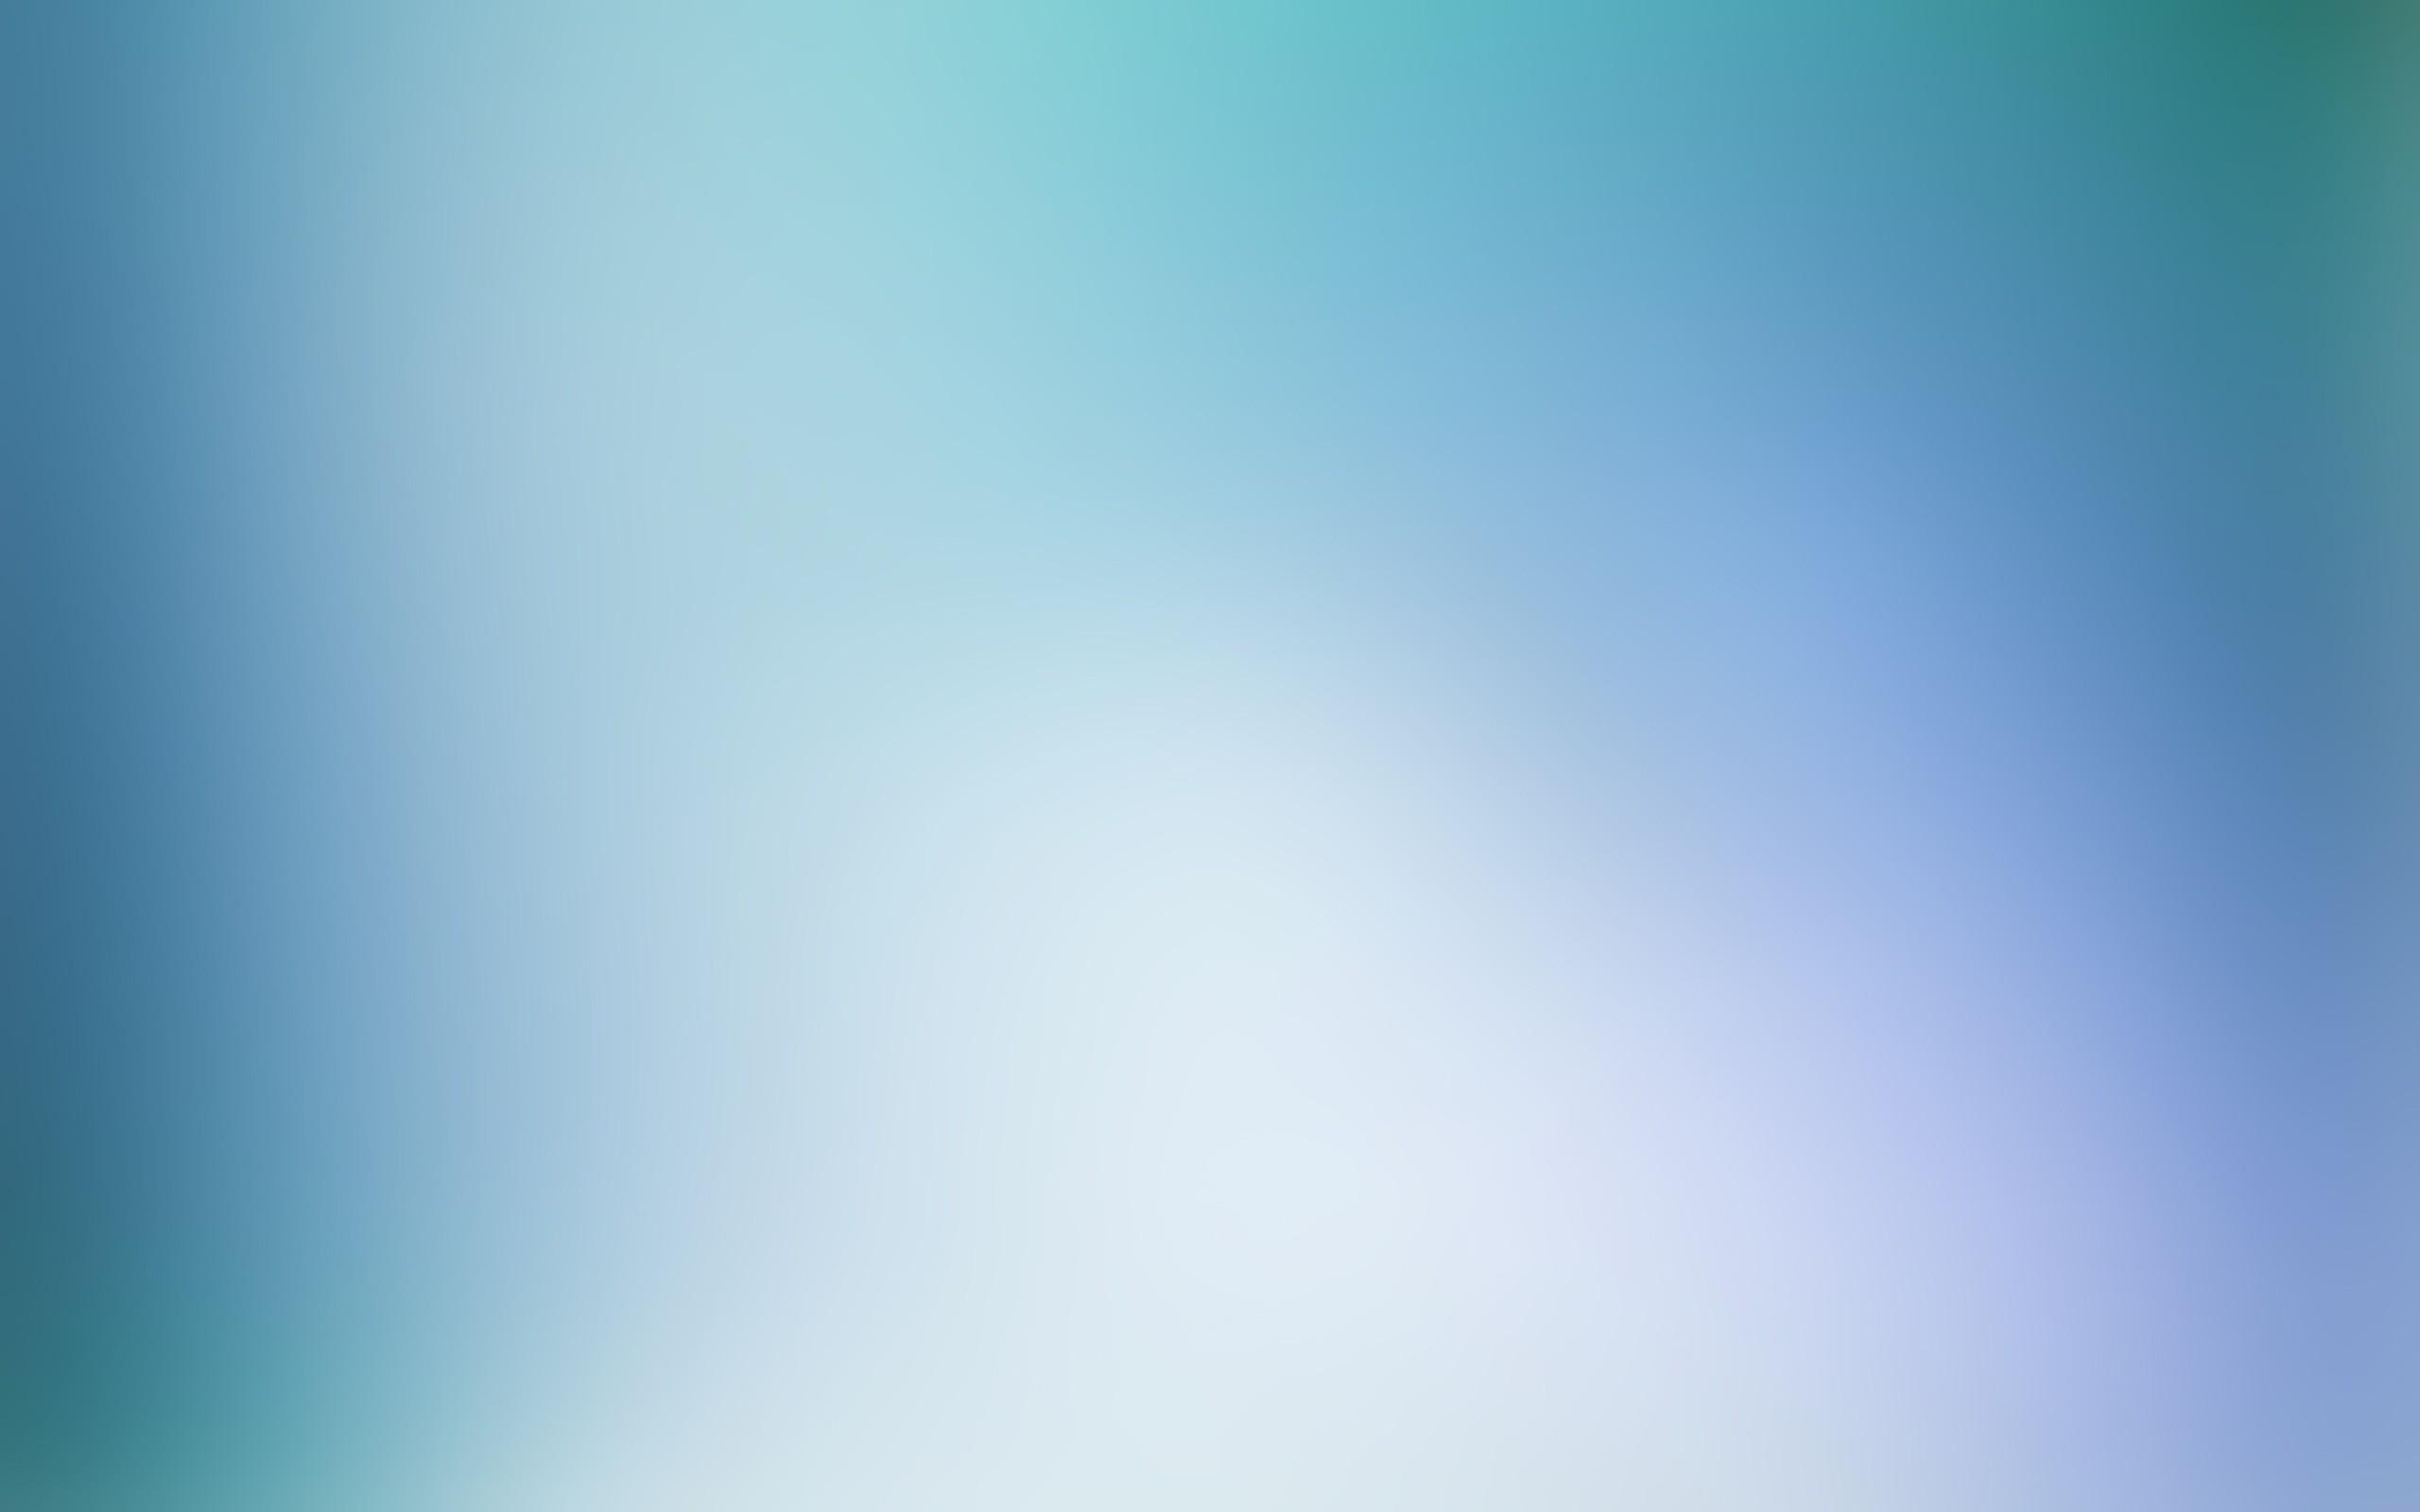 blurred gradient minimalism